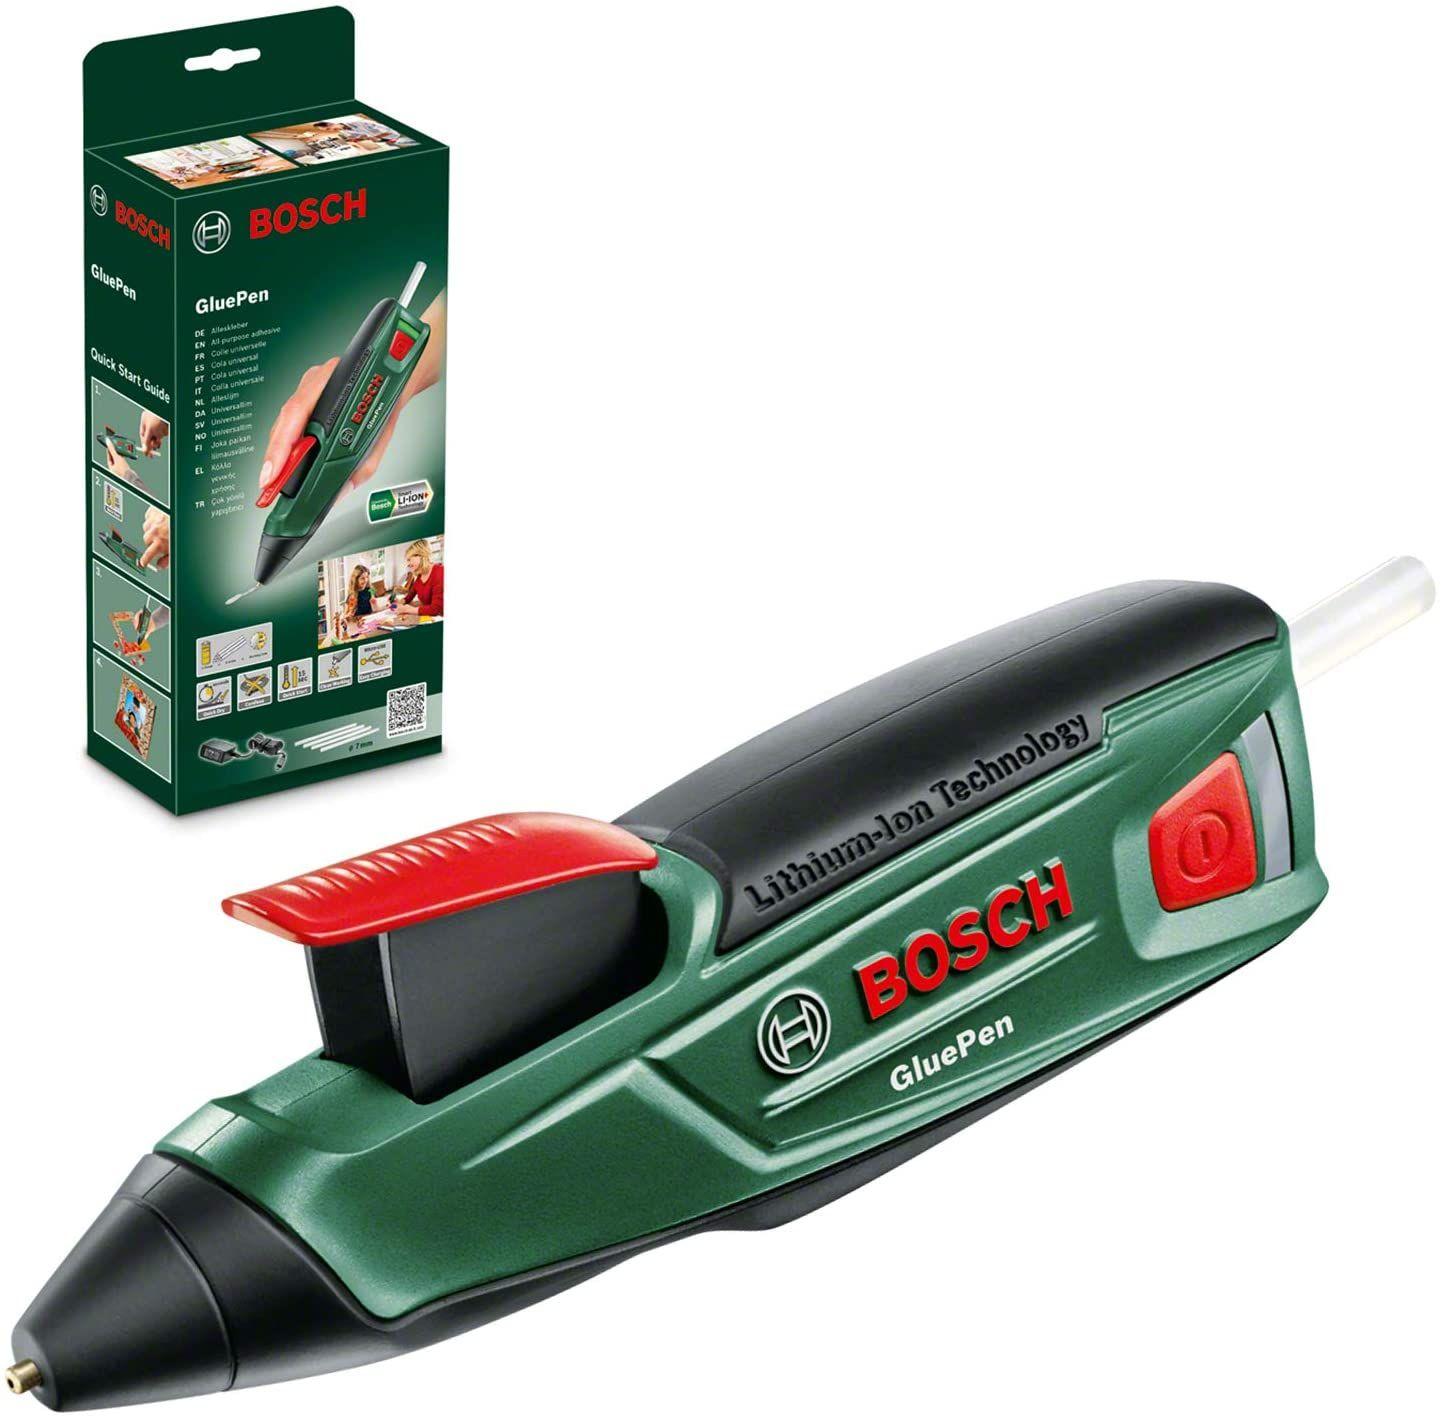 Bosch Akku Heißklebepistole GluePen (Micro-USB-Ladegerät, 4x Klebestick Ultrapower, 170°, 3,6 Volt, 30 Min. Akkulaufzeit)